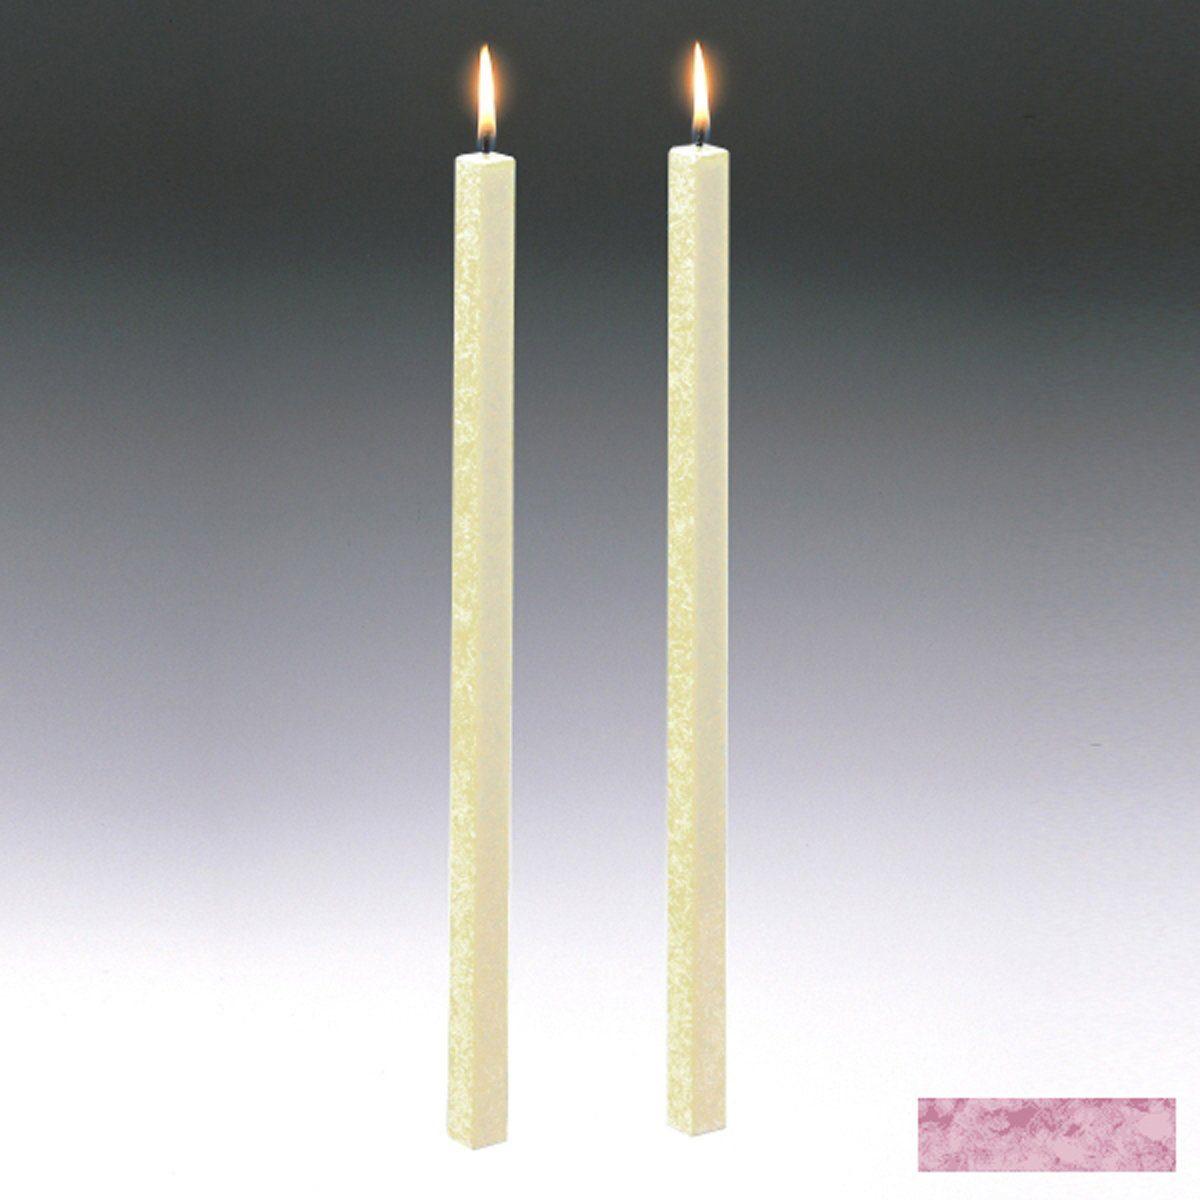 Amabiente Amabiente Kerze CLASSIC Malve 40cm - 2er Set